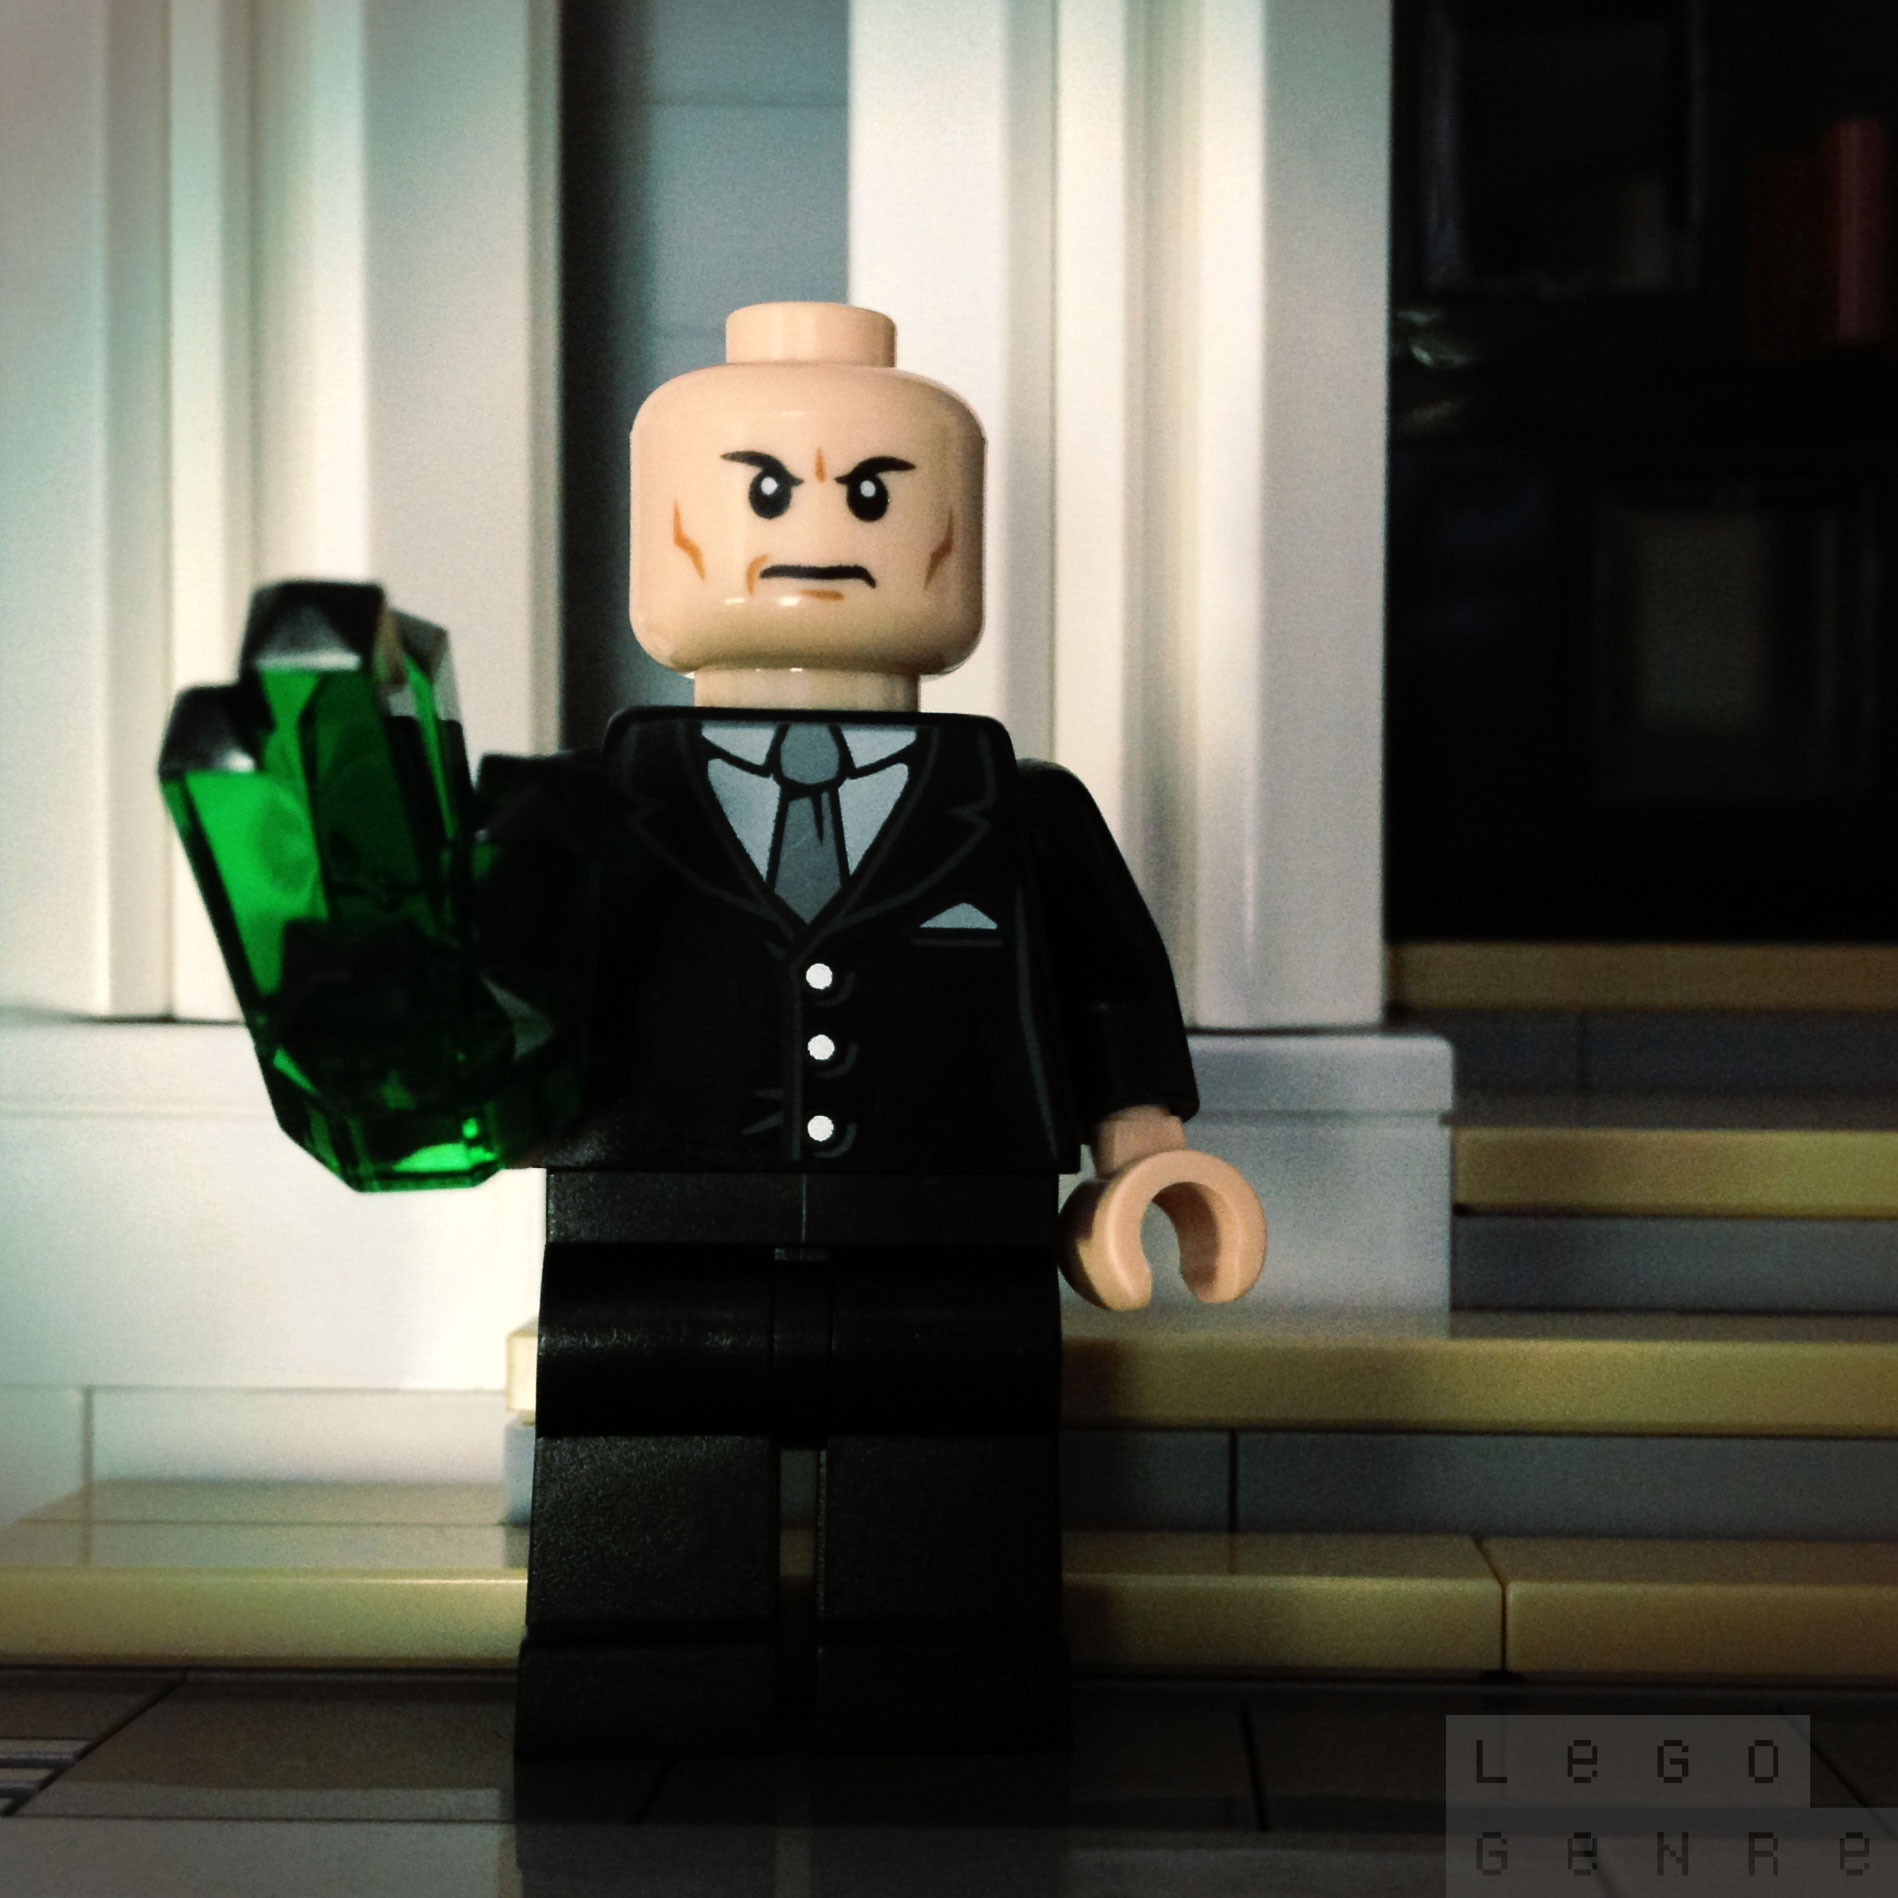 LegoGenre 00289: Lex Luthor